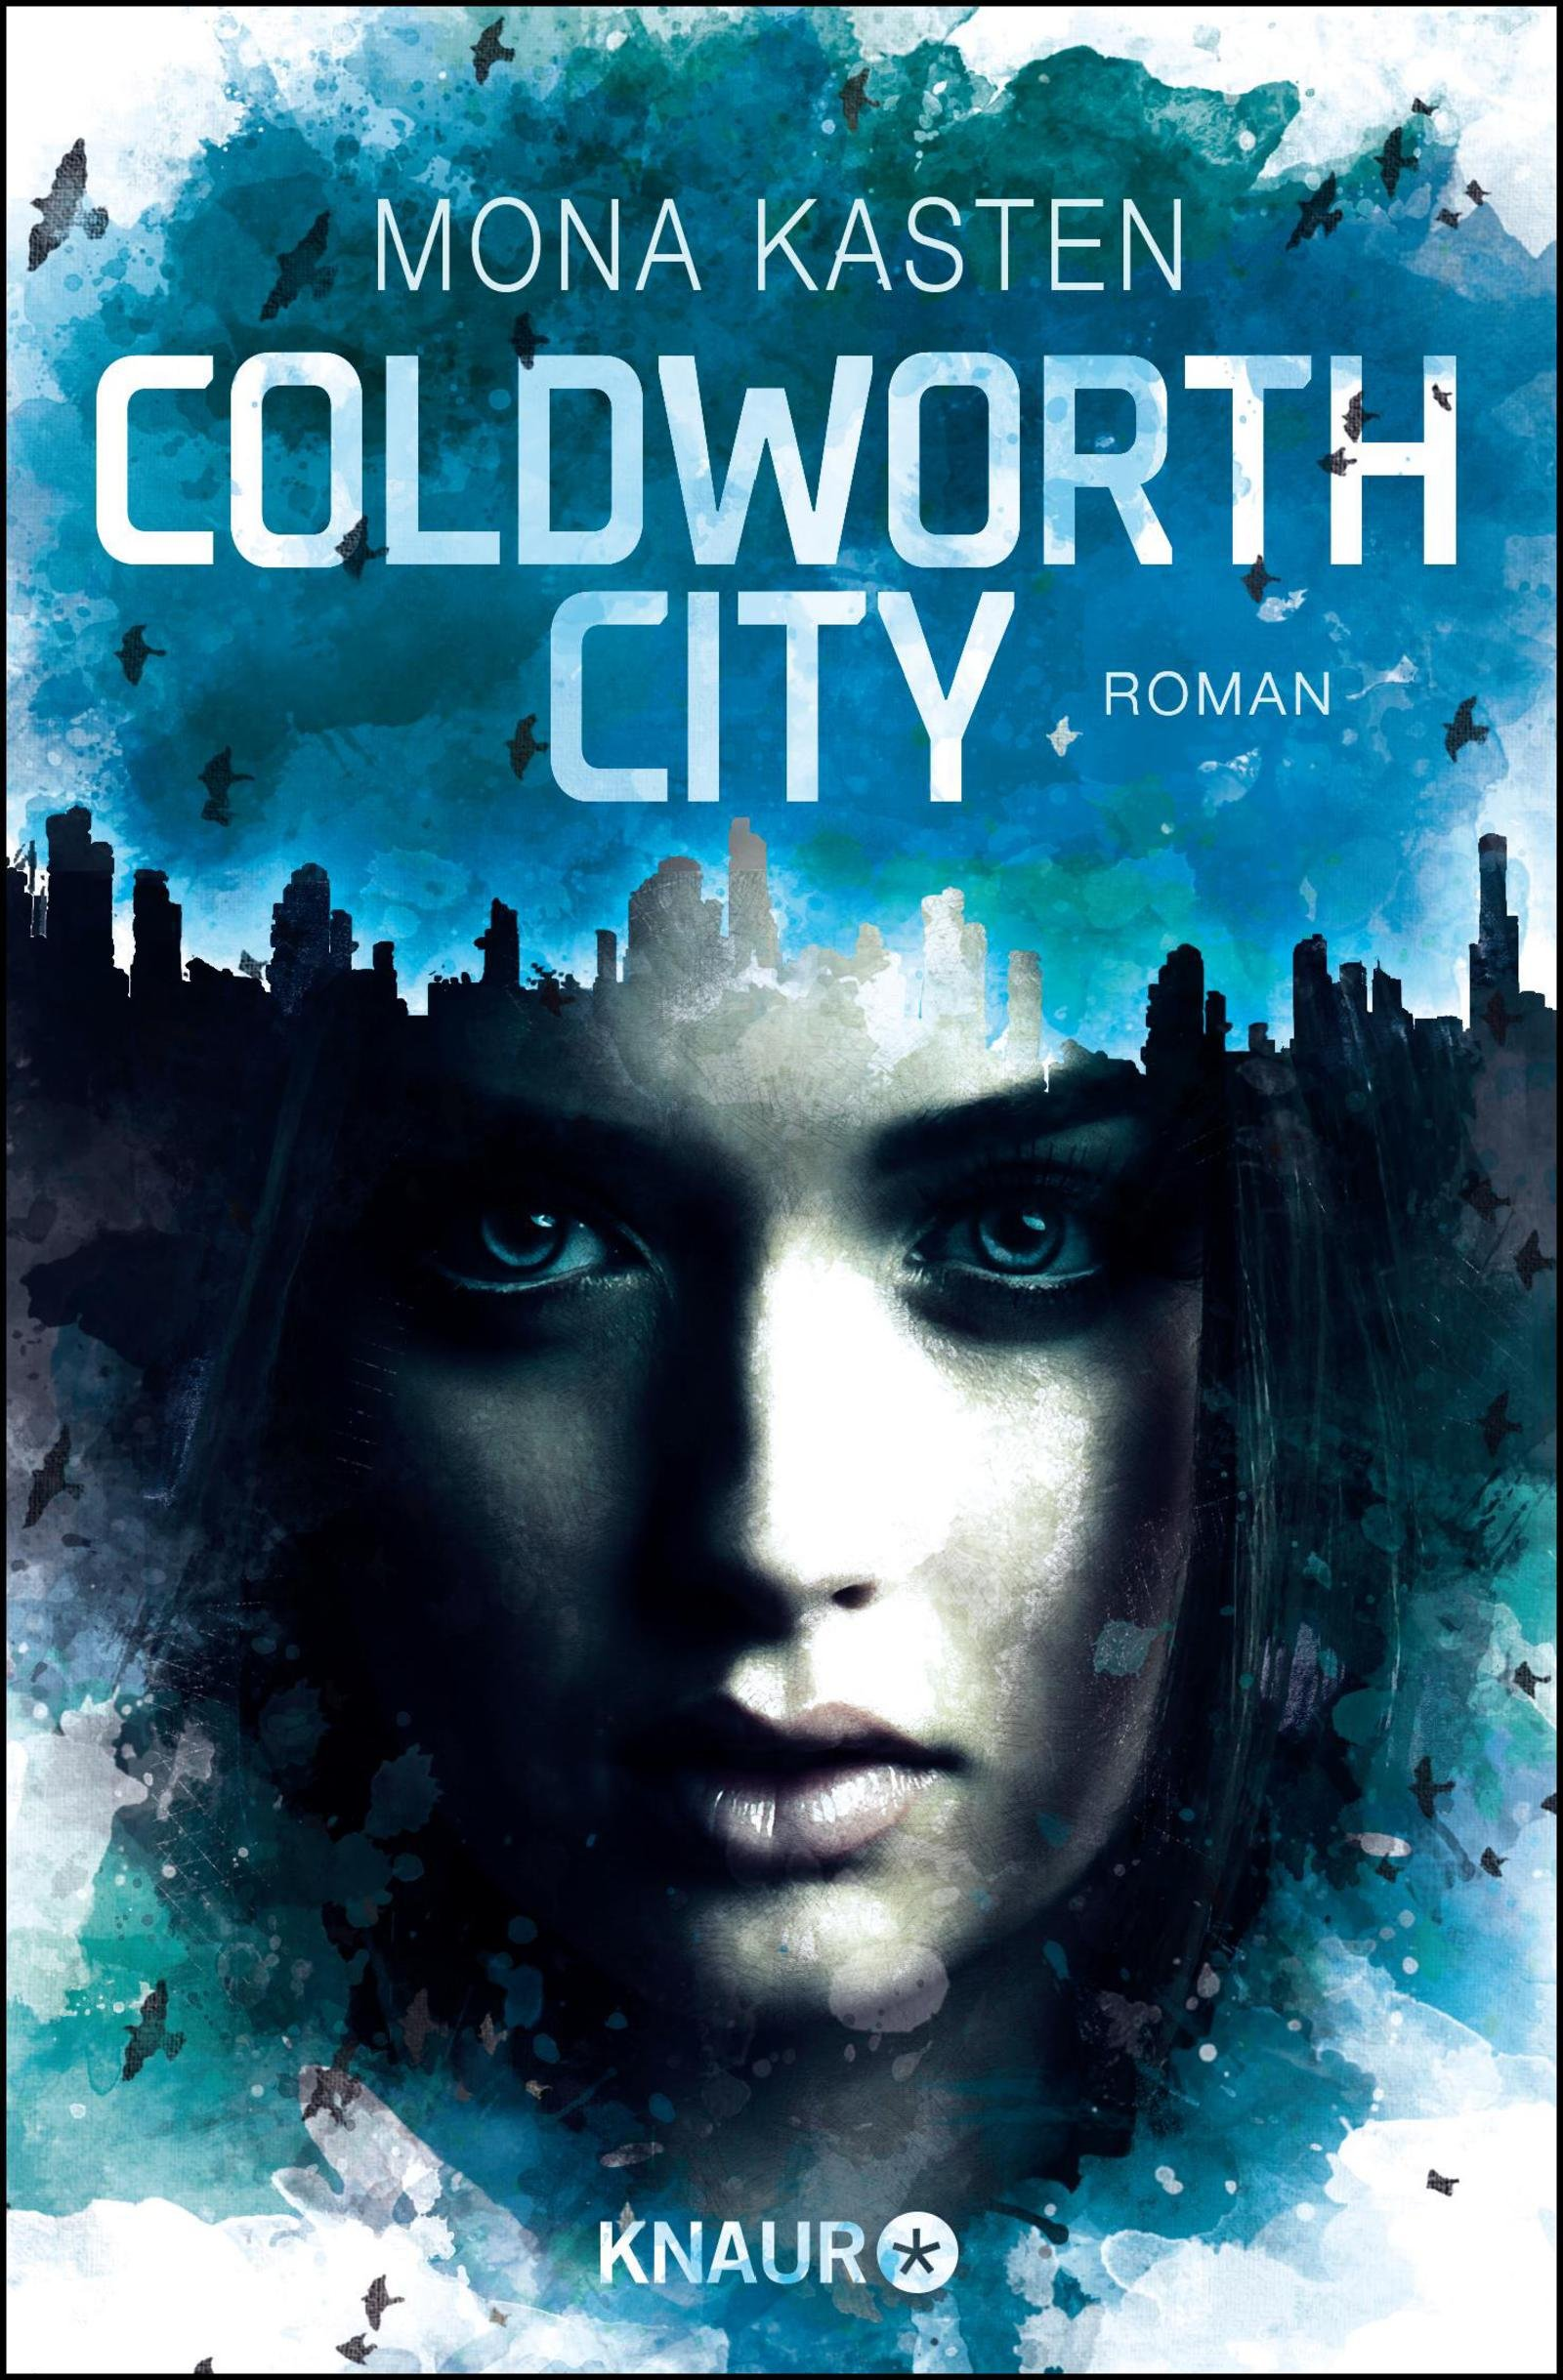 ColdworthCity